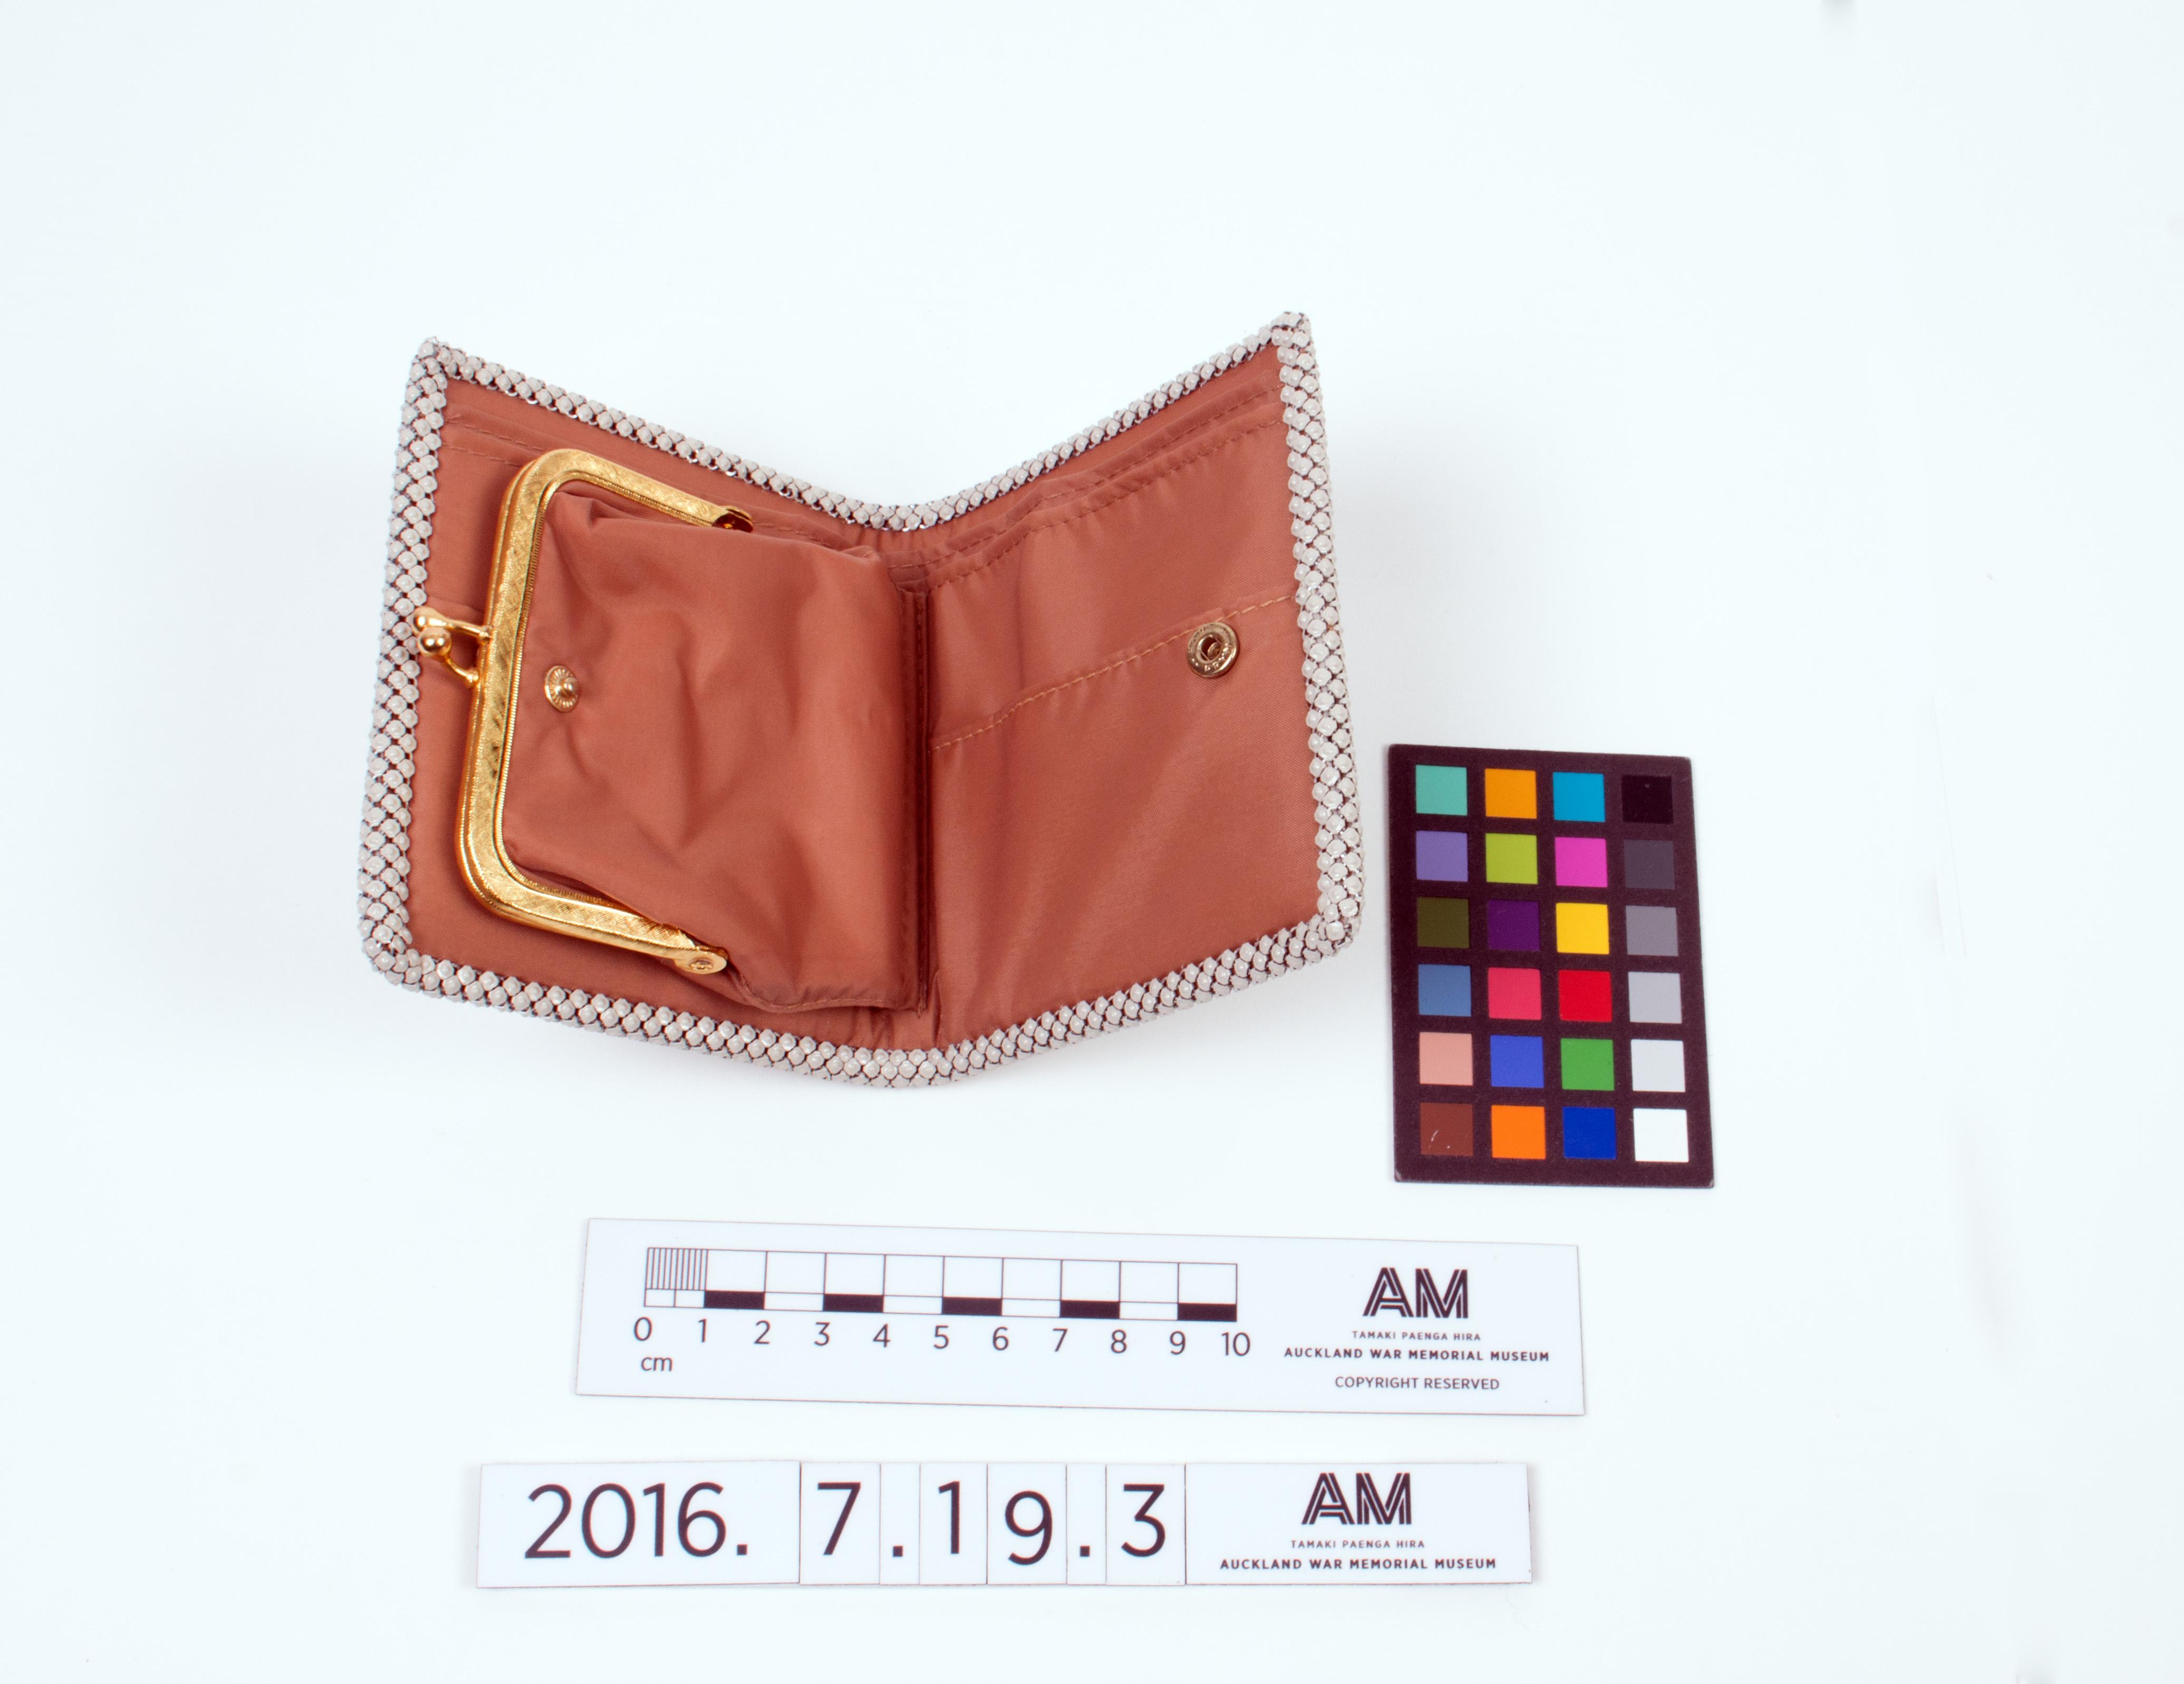 File Handbag And Purse Am 2017 7 19 9 Jpg